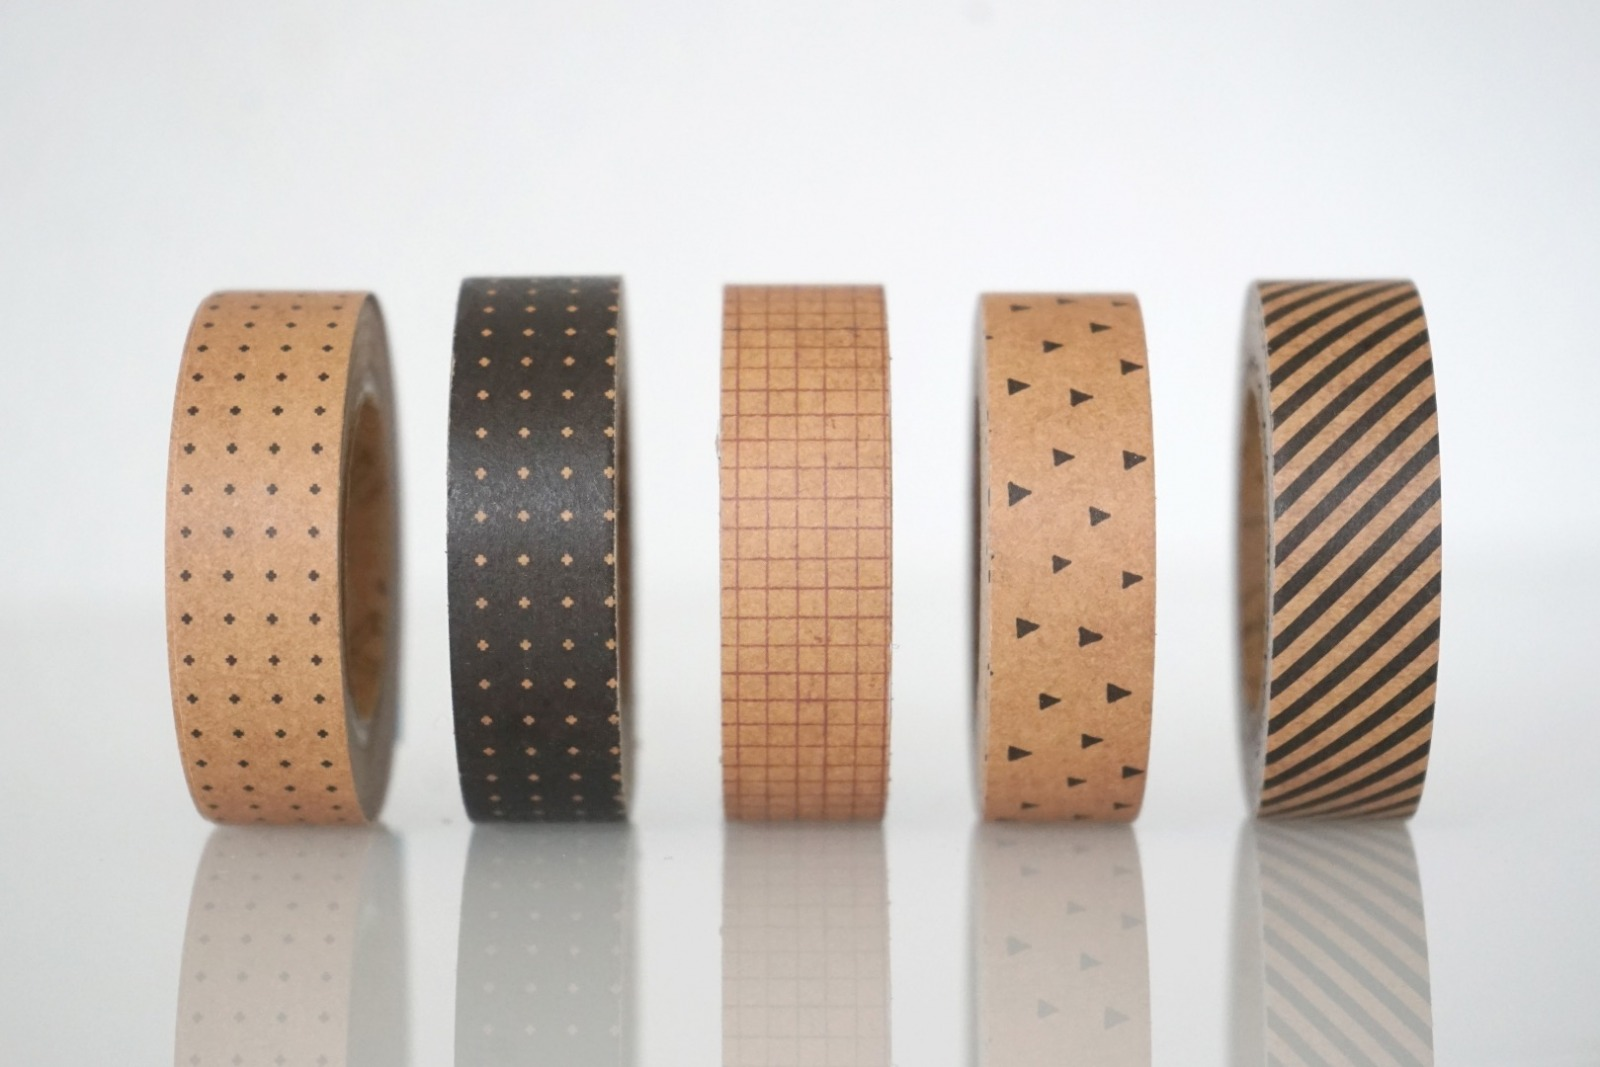 Klebeband Kraftpapier geometrische Muster 2